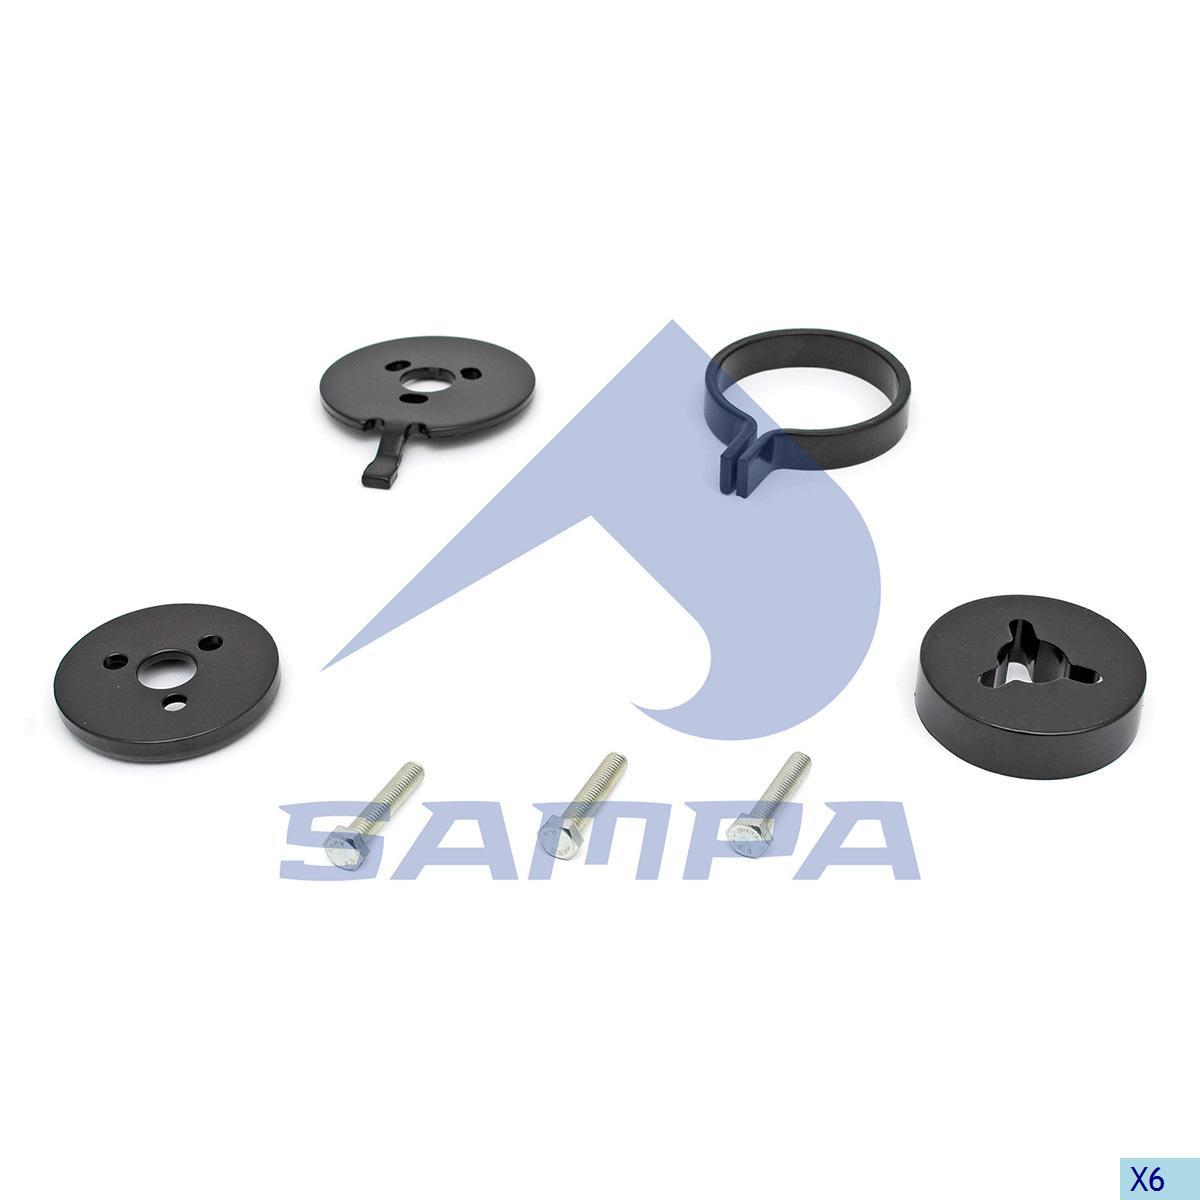 Repair Kit, Trailer Coupling, Rockinger, Complementary Equipment